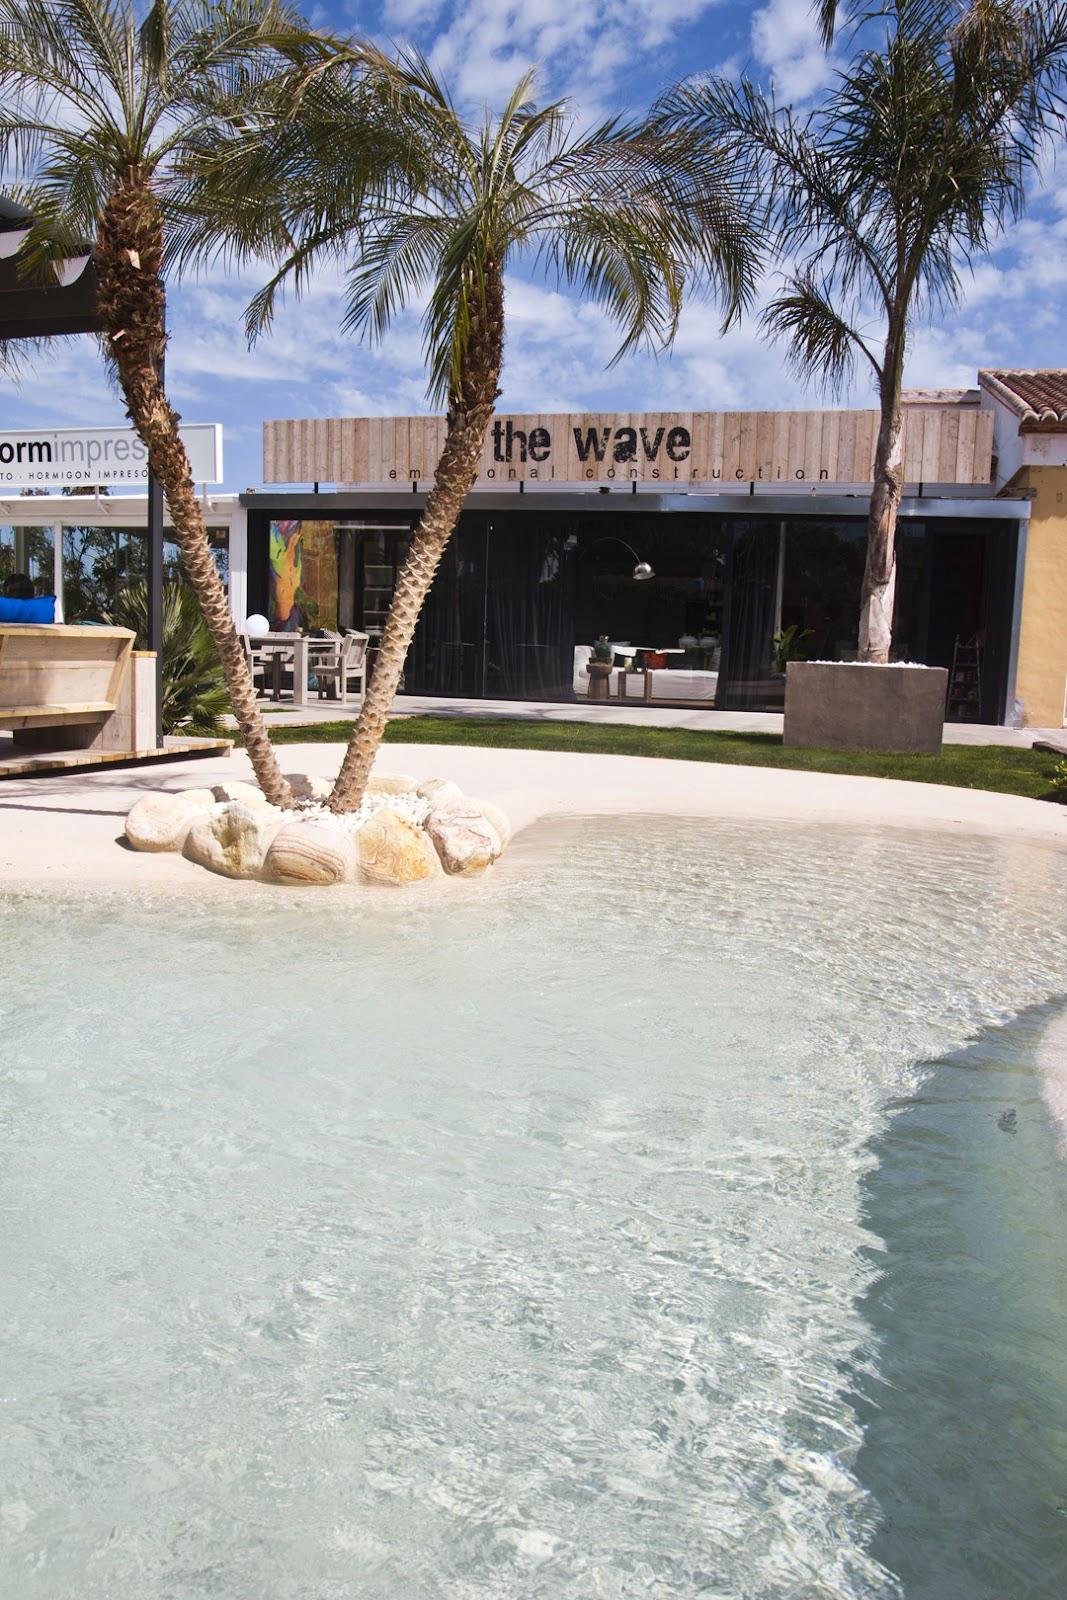 Piscina de arena en the wave javea lucas gunitec for Construccion de piscinas de arena